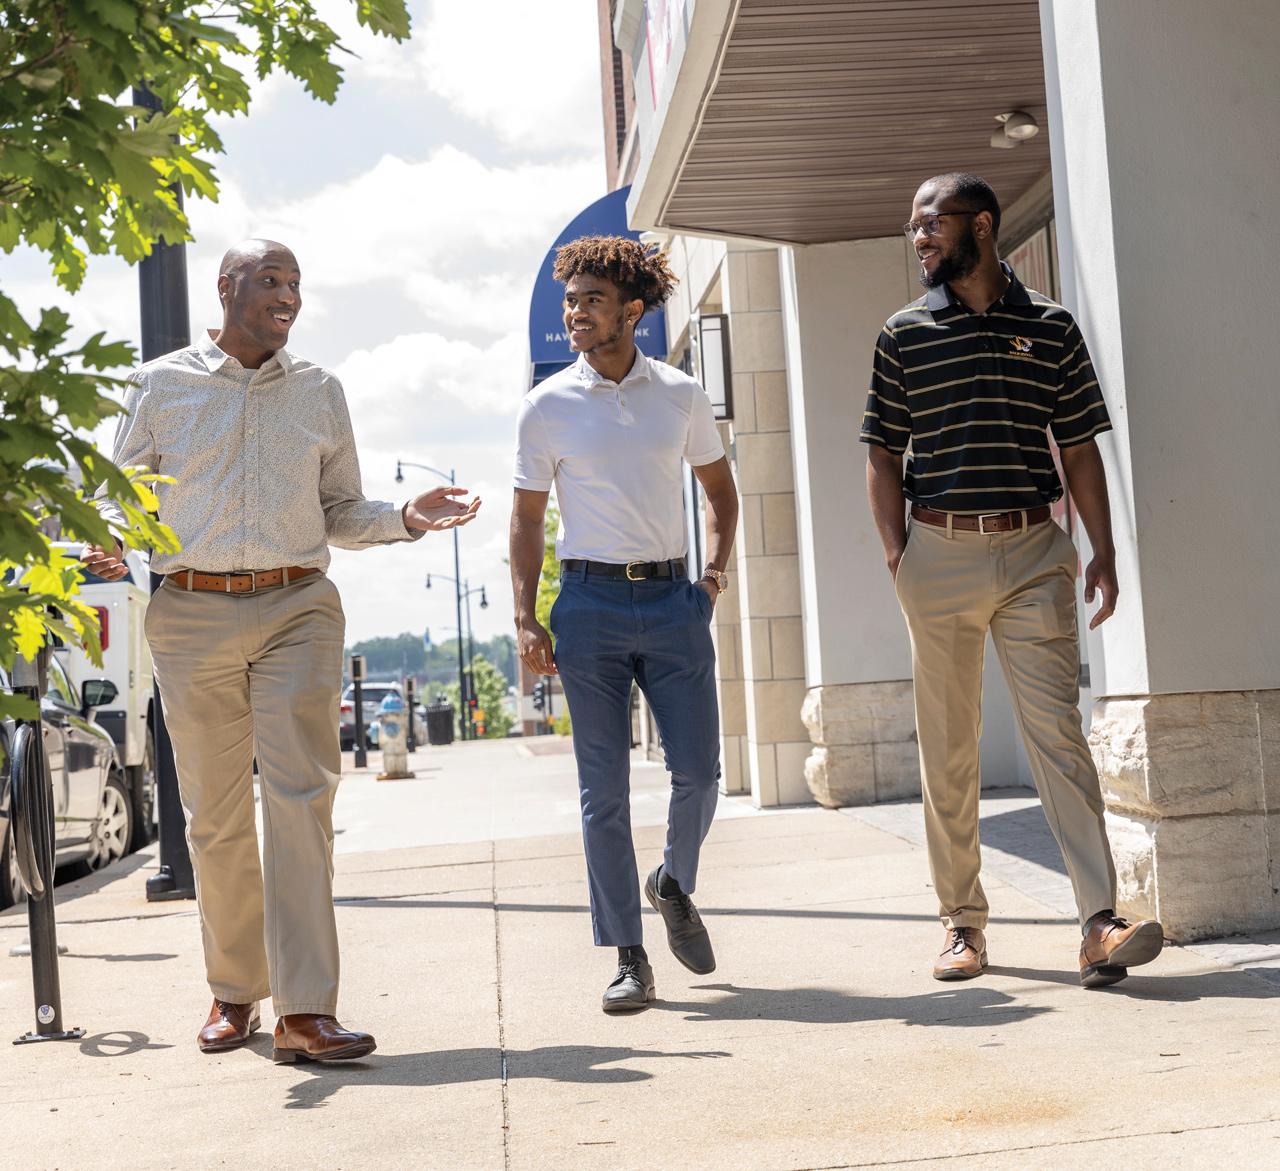 three young men walking on sidewalk downtown Columbia